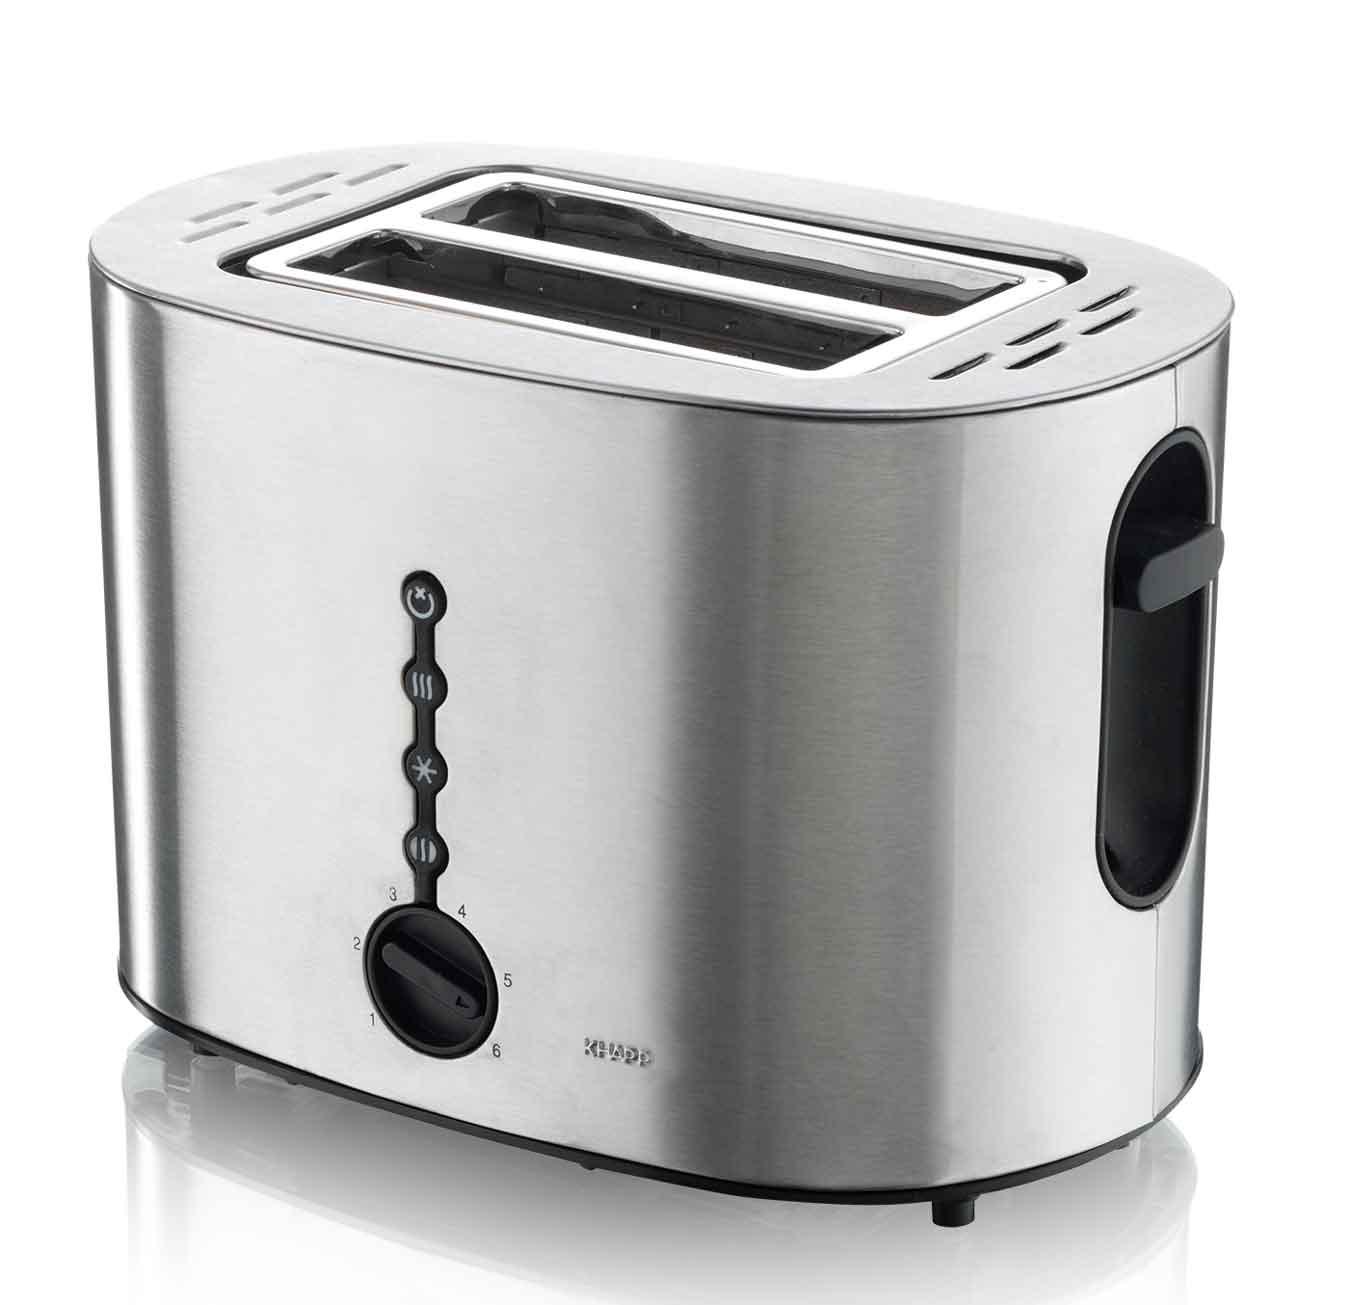 Edelstahl-Toaster KHAPP 15140004 – Bild 3